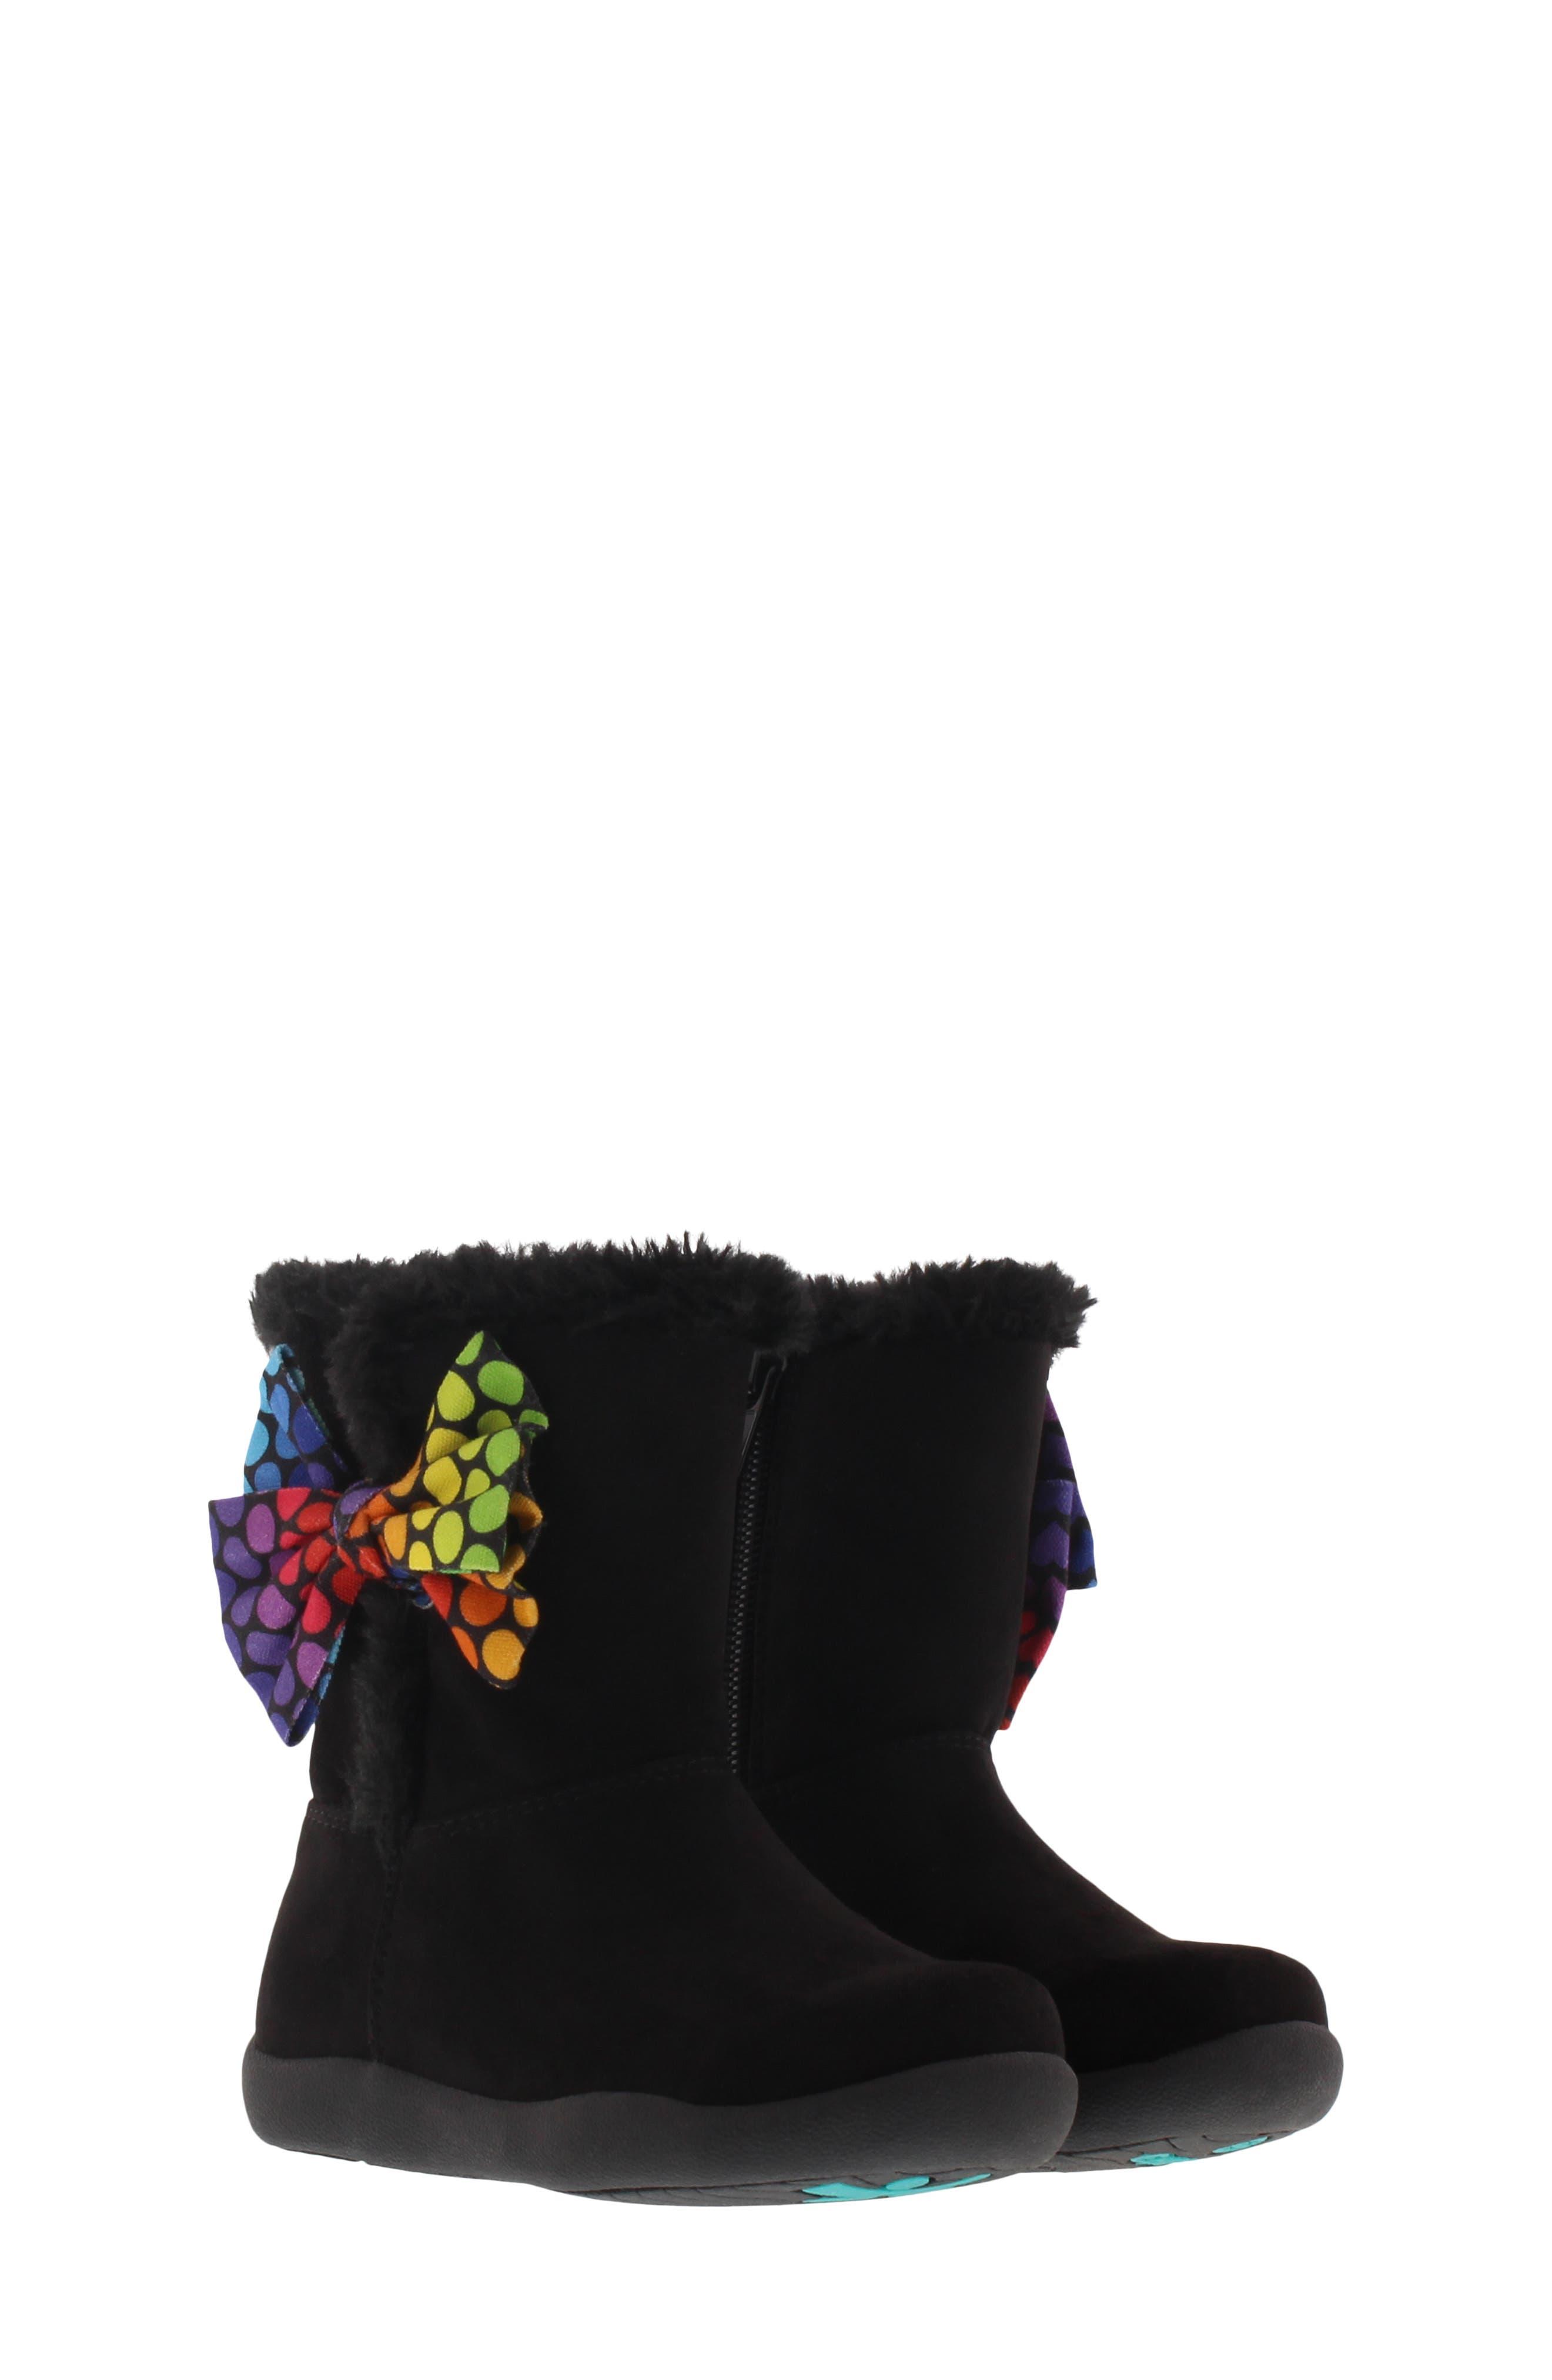 CHOOZE, Wish Faux Fur Lined Boot, Main thumbnail 1, color, BLACK